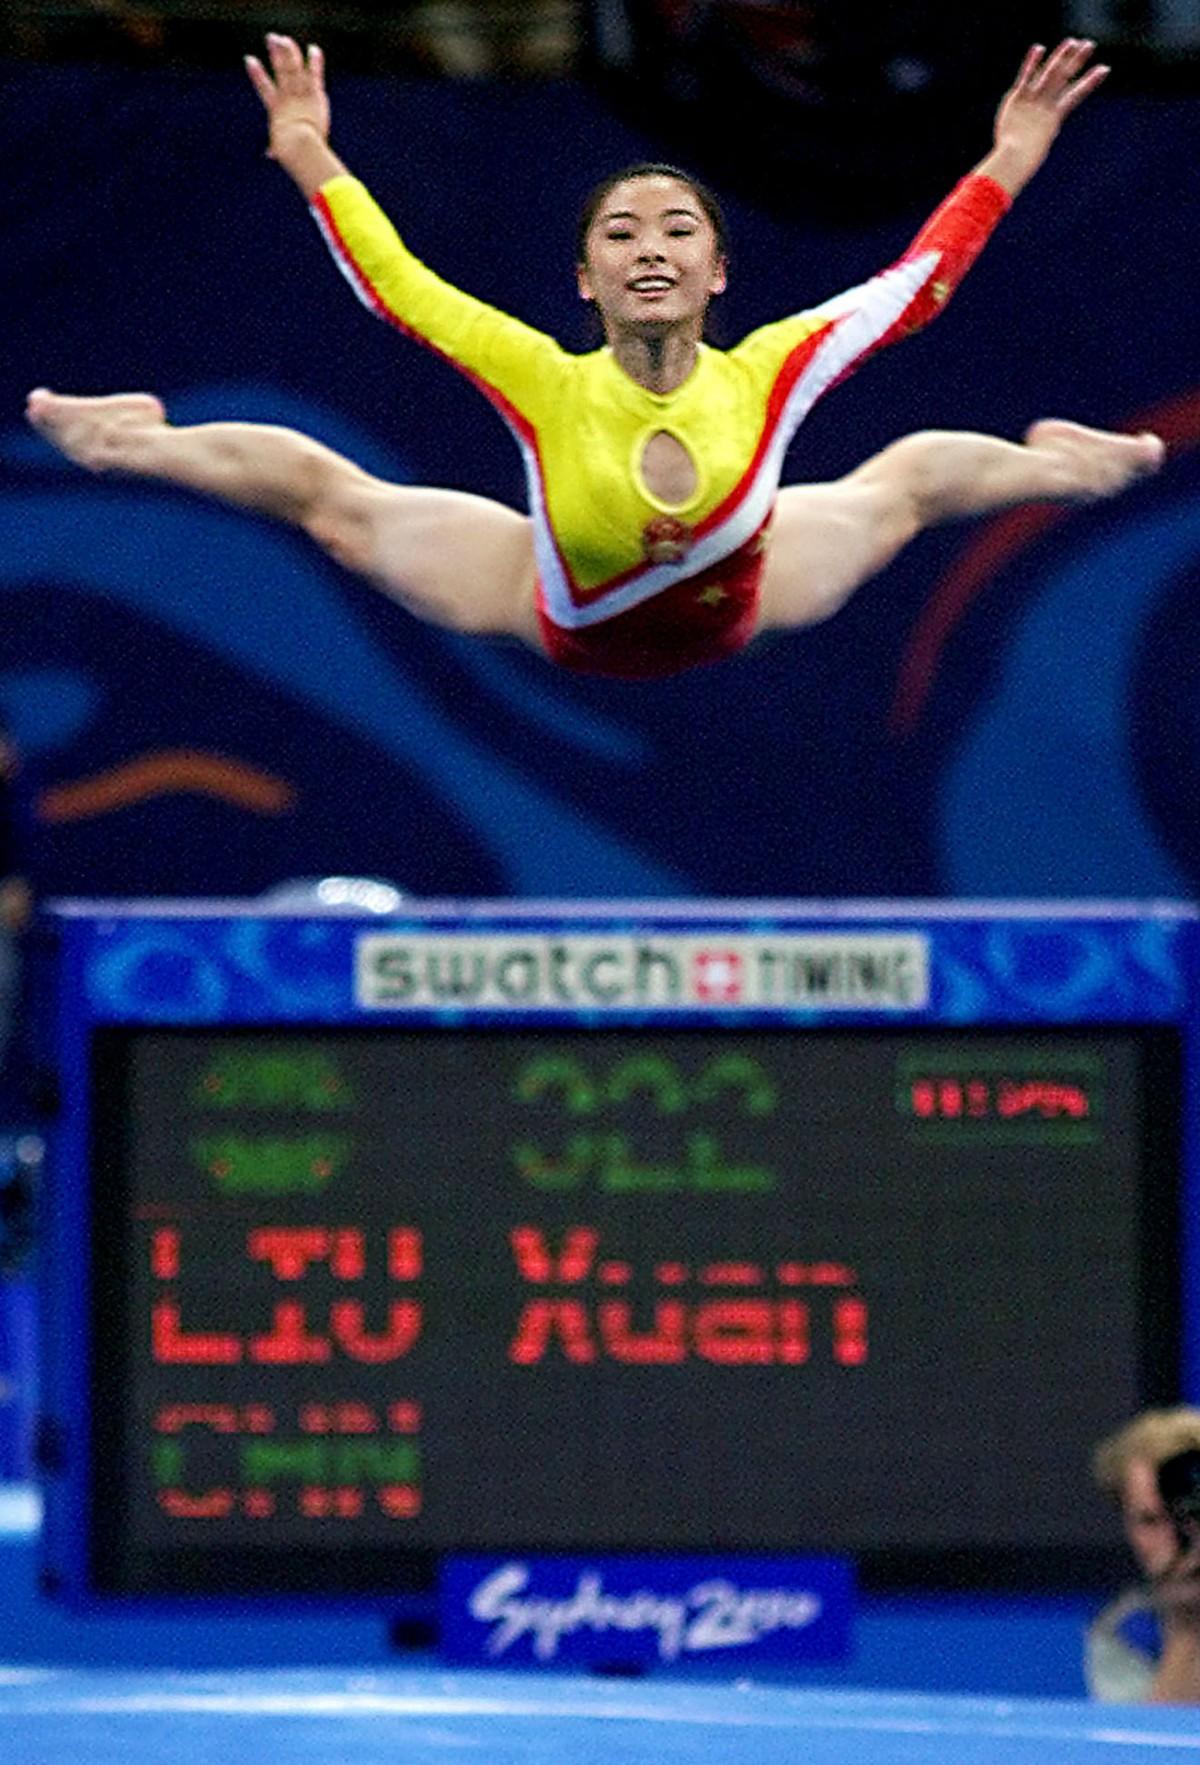 Sydney Olympic 2000